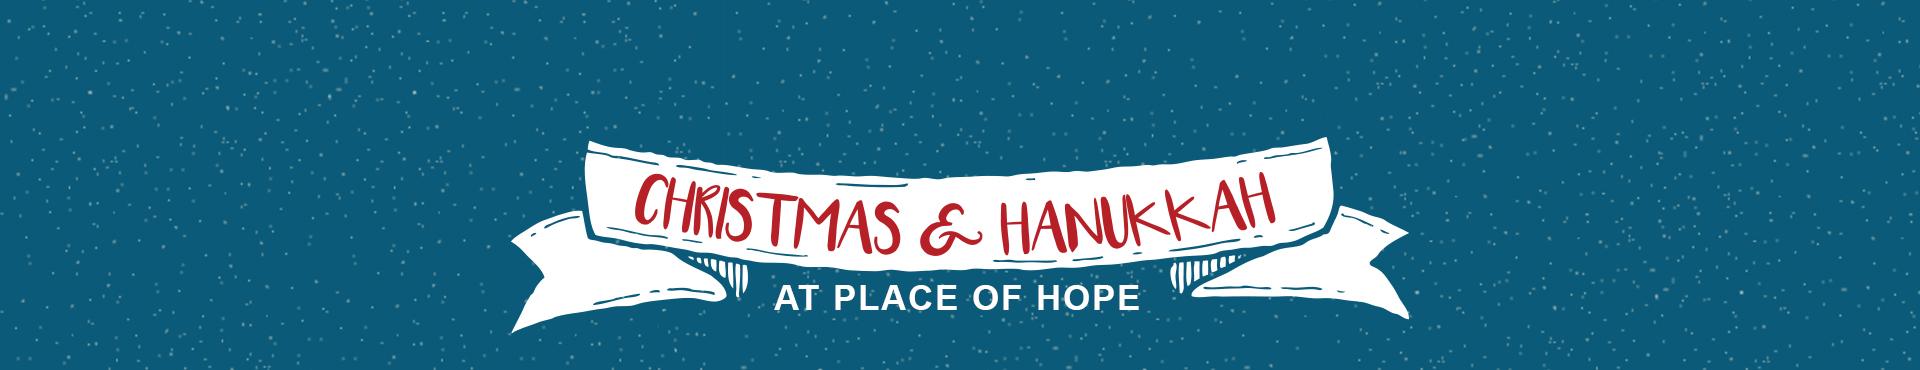 Christmas and Hanukkah header image